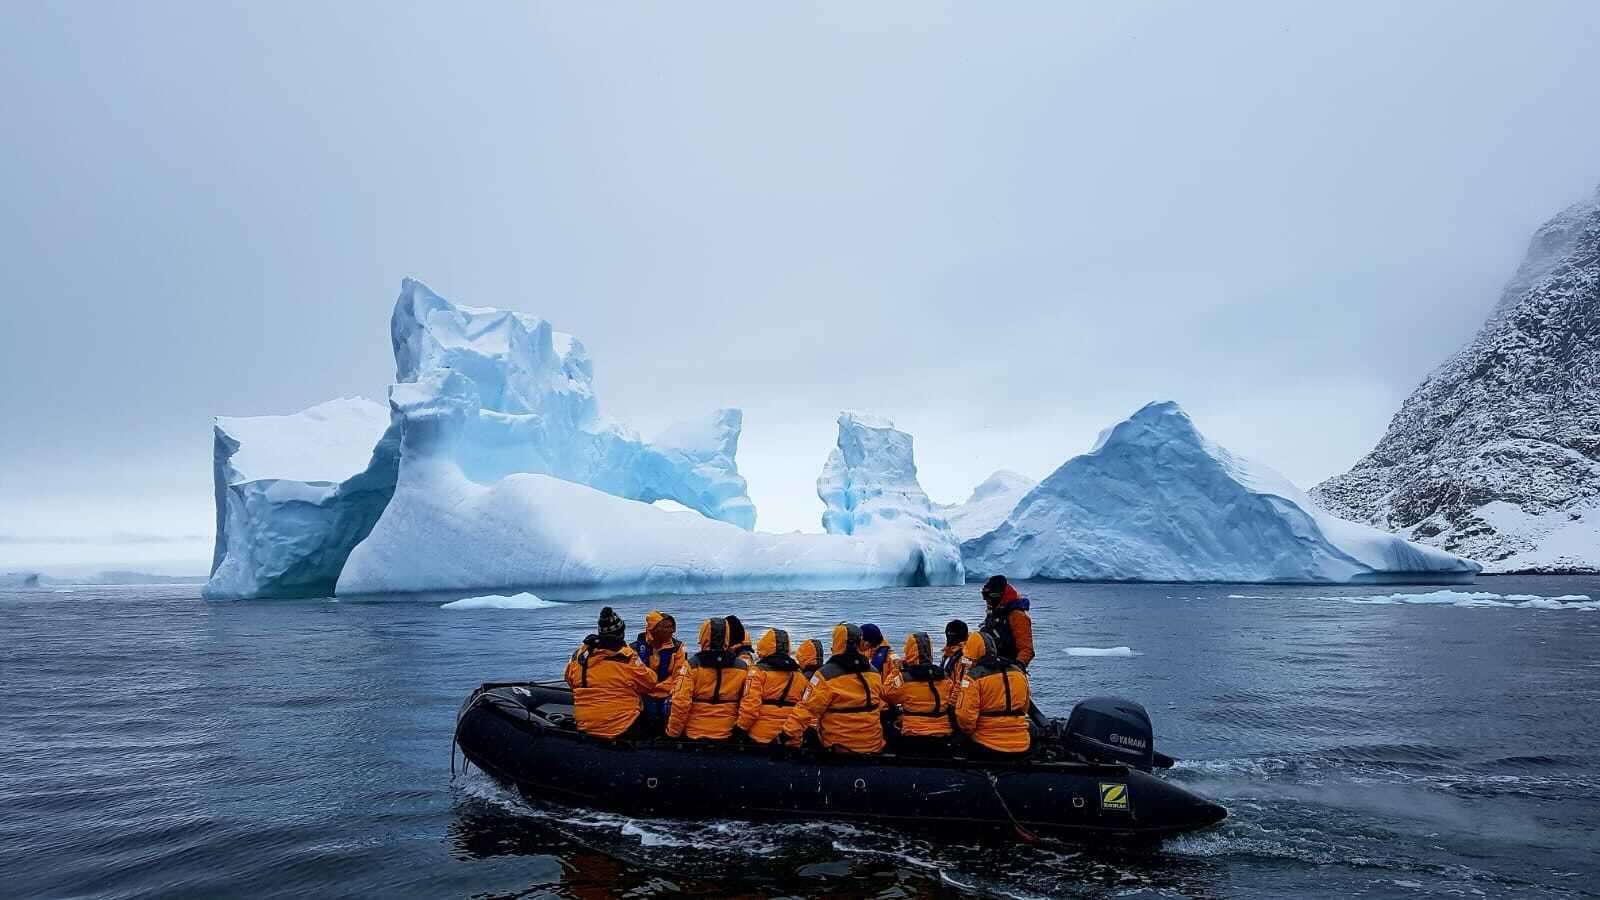 A rubber exploratory vessel full of people explores around icebergs in Antarctica